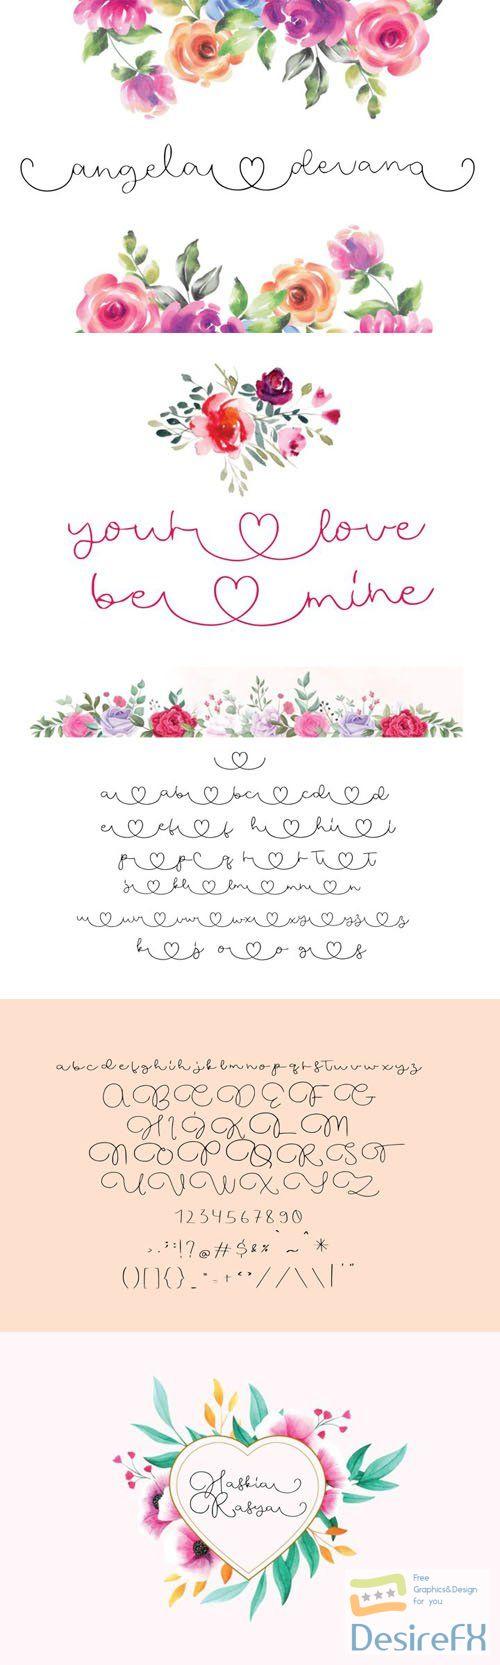 Angela Devano Wedding Love Calligraphy - Minimalist Script Font